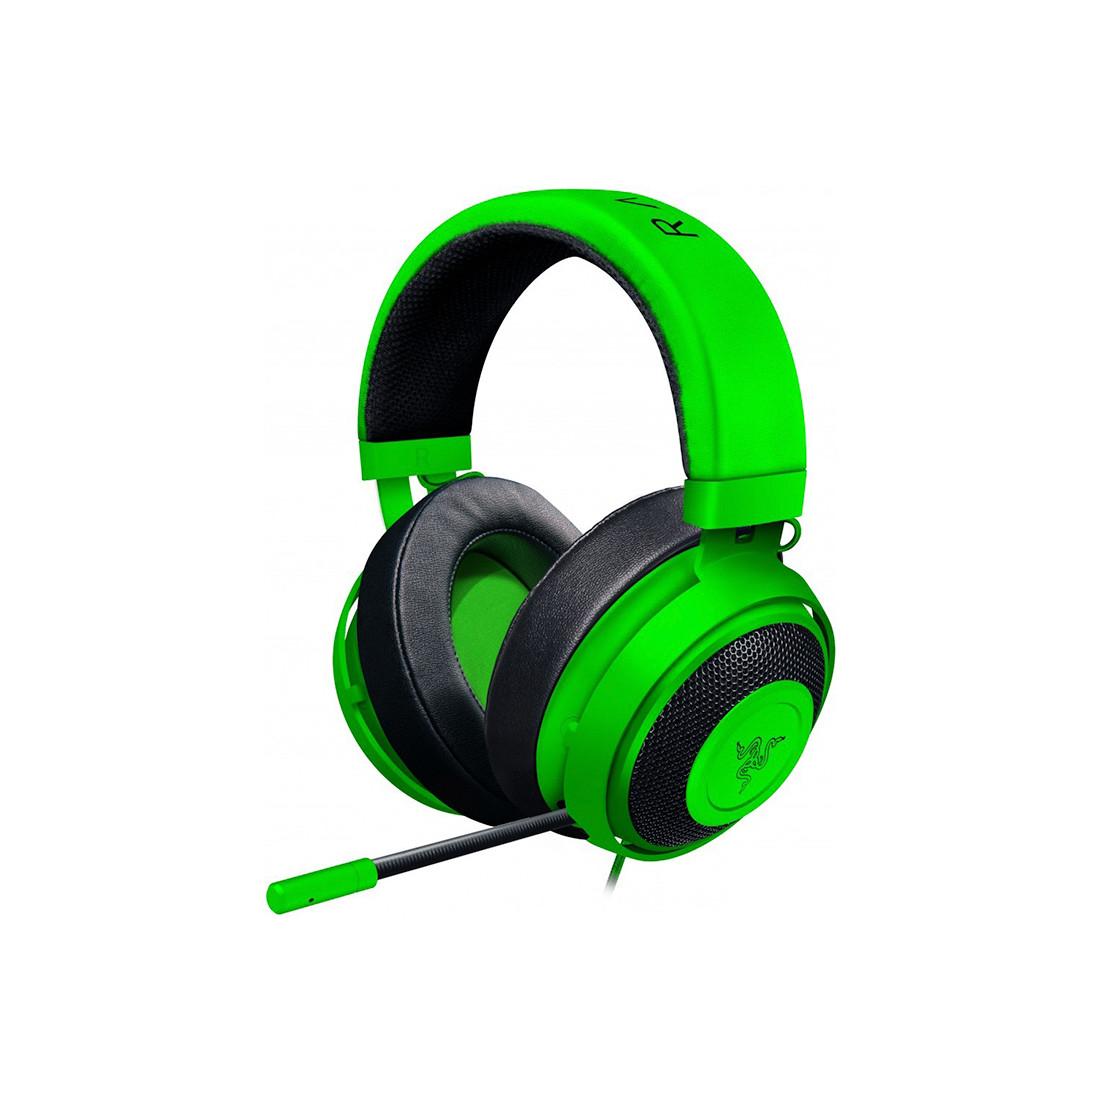 Гарнитура Razer Kraken Pro V2 Oval RZ04-02050600-R3M1 (Green)